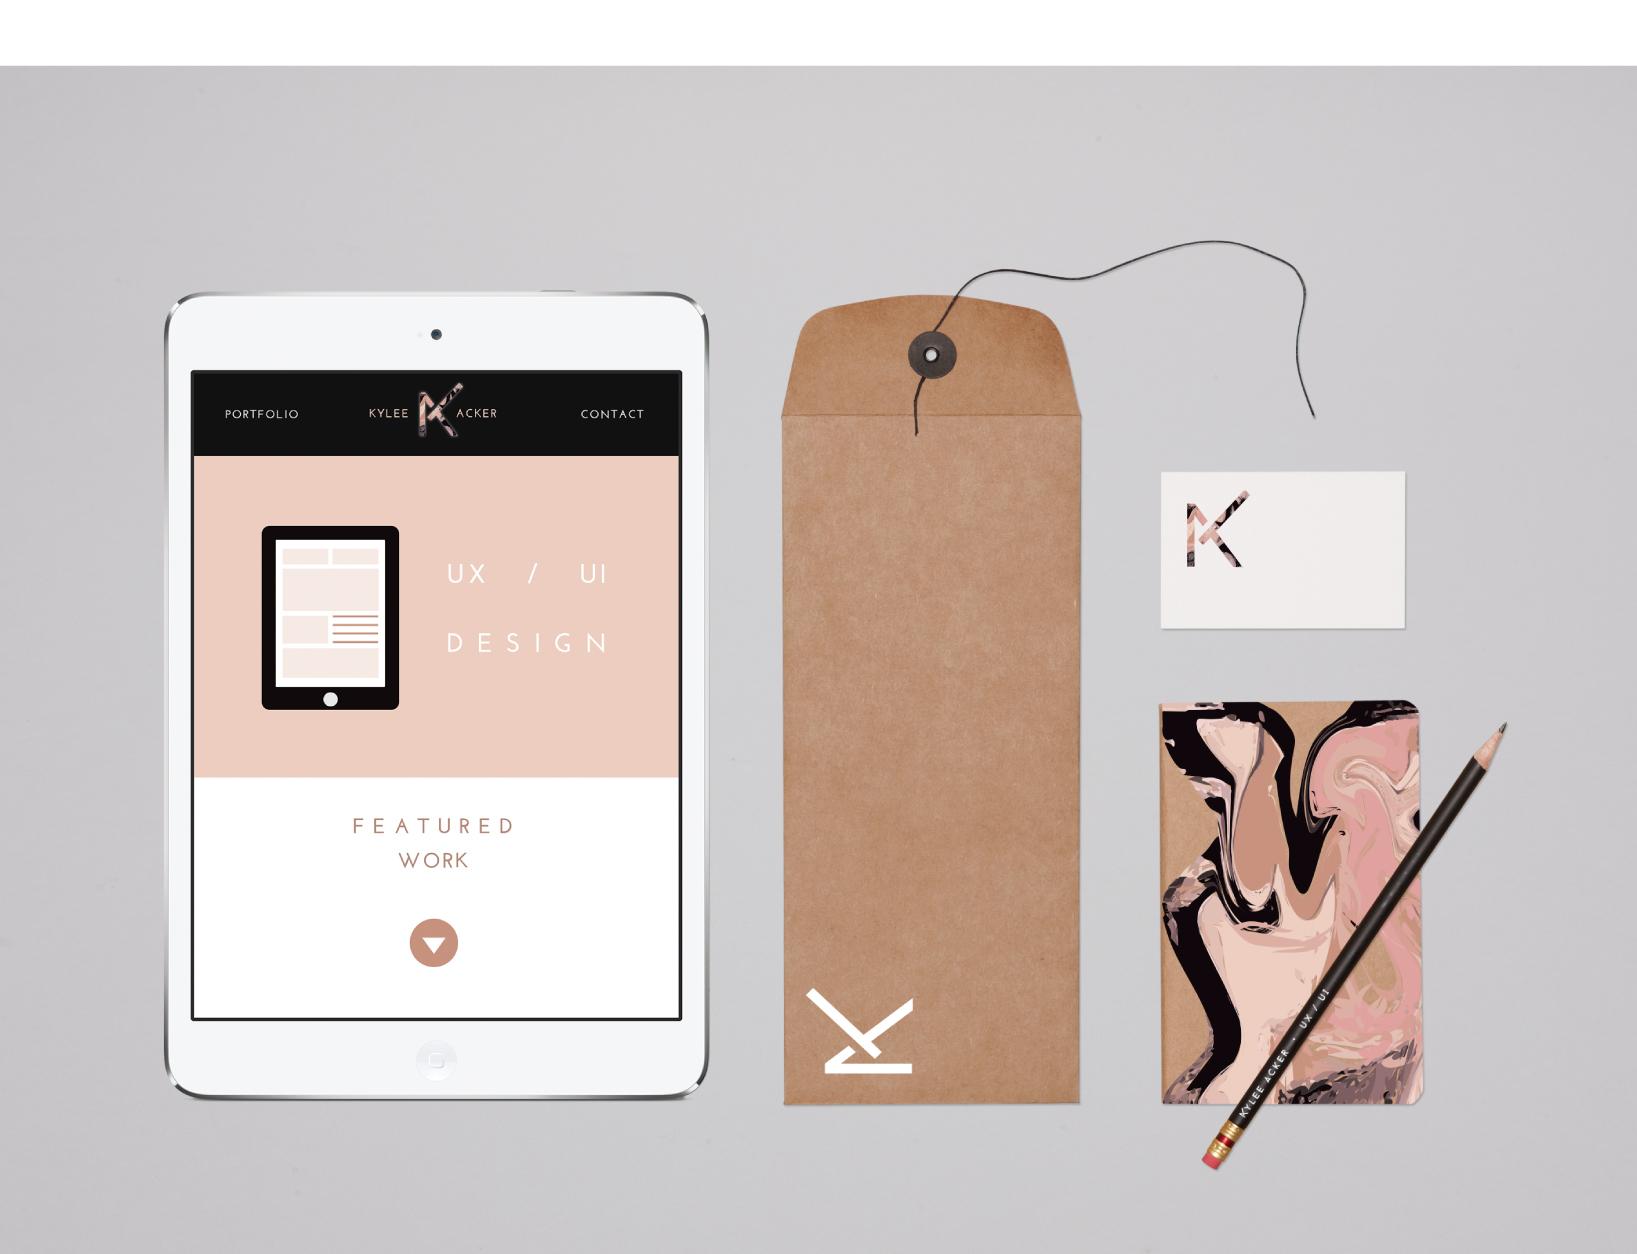 Kylee-Acker-Portfolio-Board-Branding-04.jpg